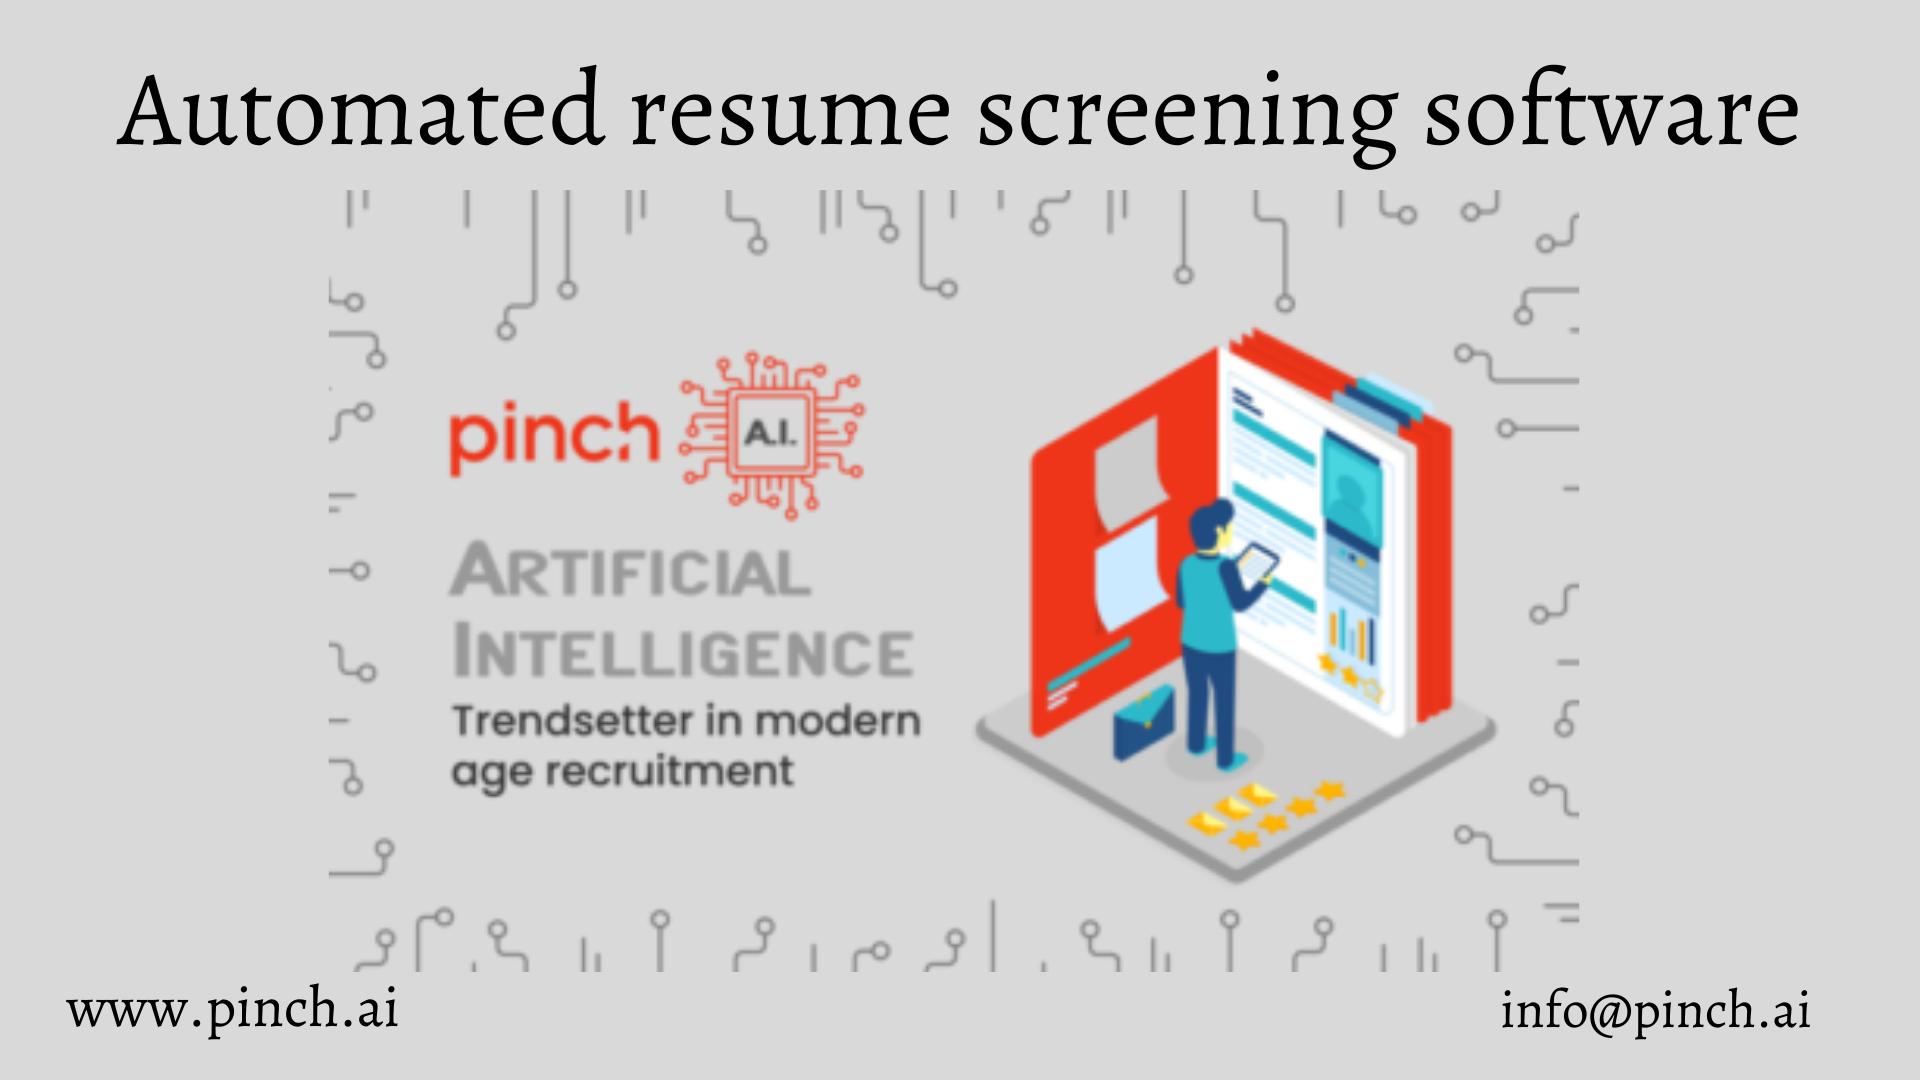 Passing Resume Screening Software Job Interview Tips Network Marketing Business Job Application Network Marketing